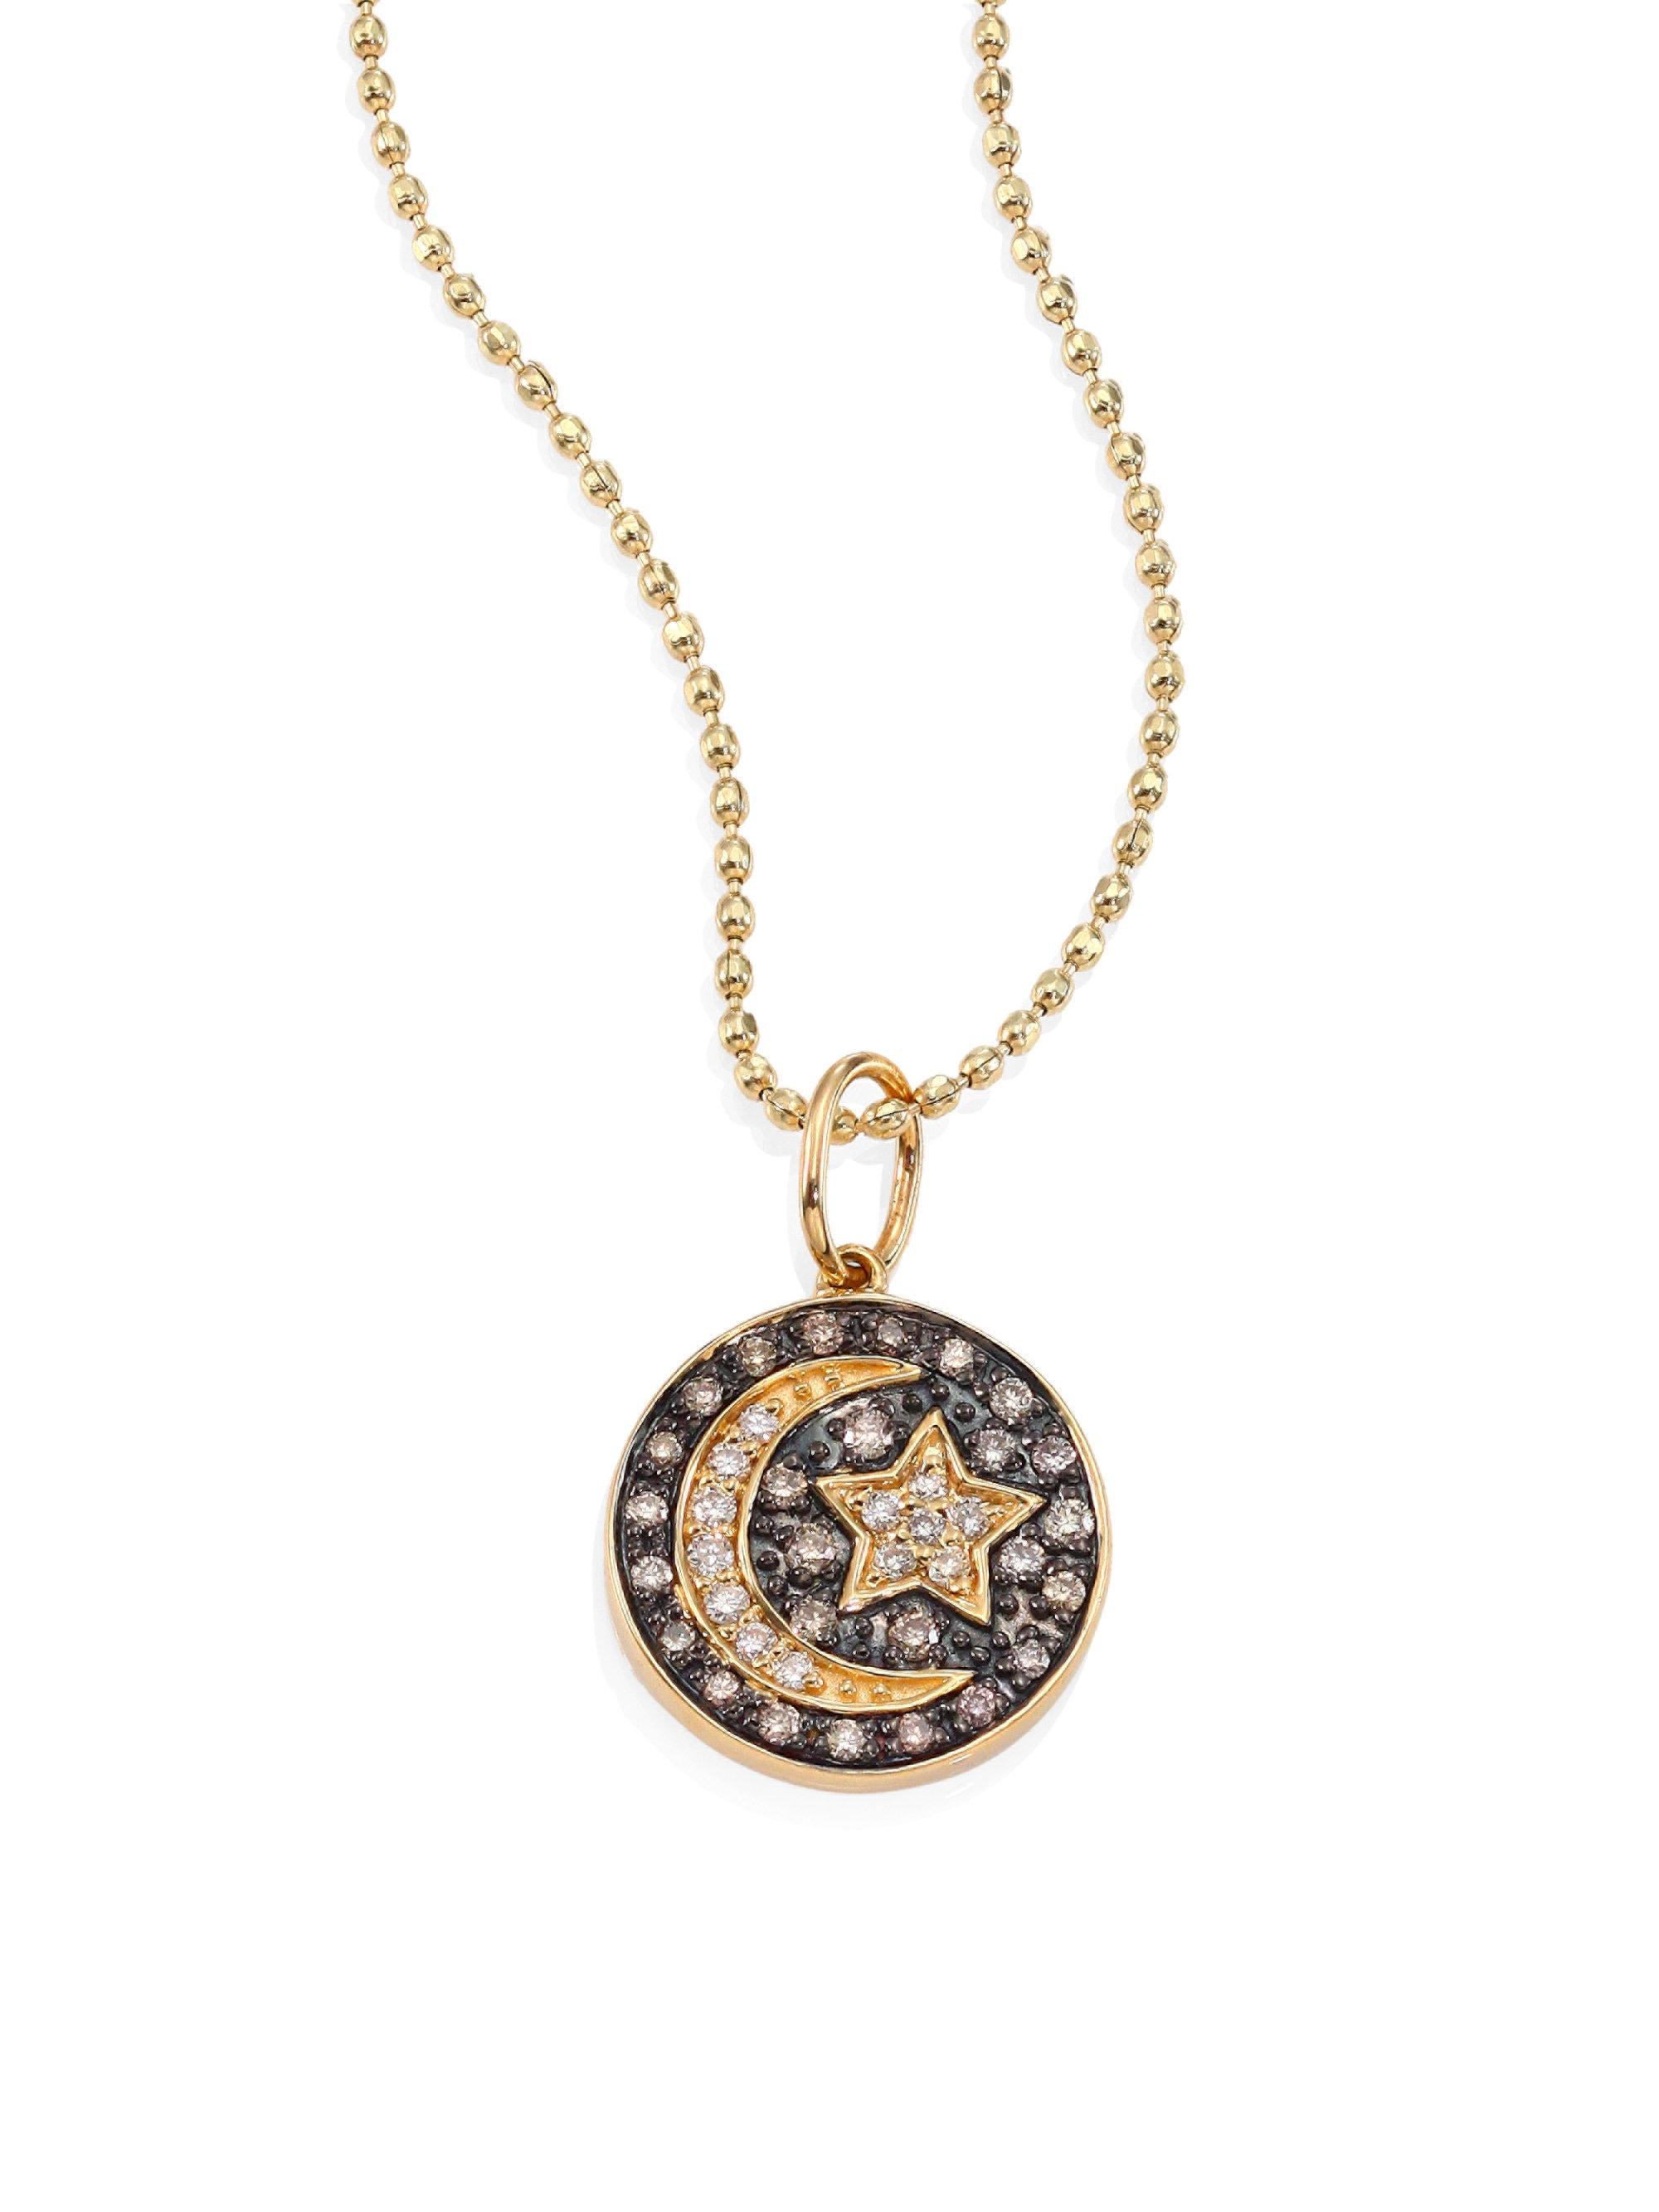 728b0a78fc0c1 Sydney Evan Metallic Small Moon And Star Diamond & 14k Yellow Gold  Medallion Necklace